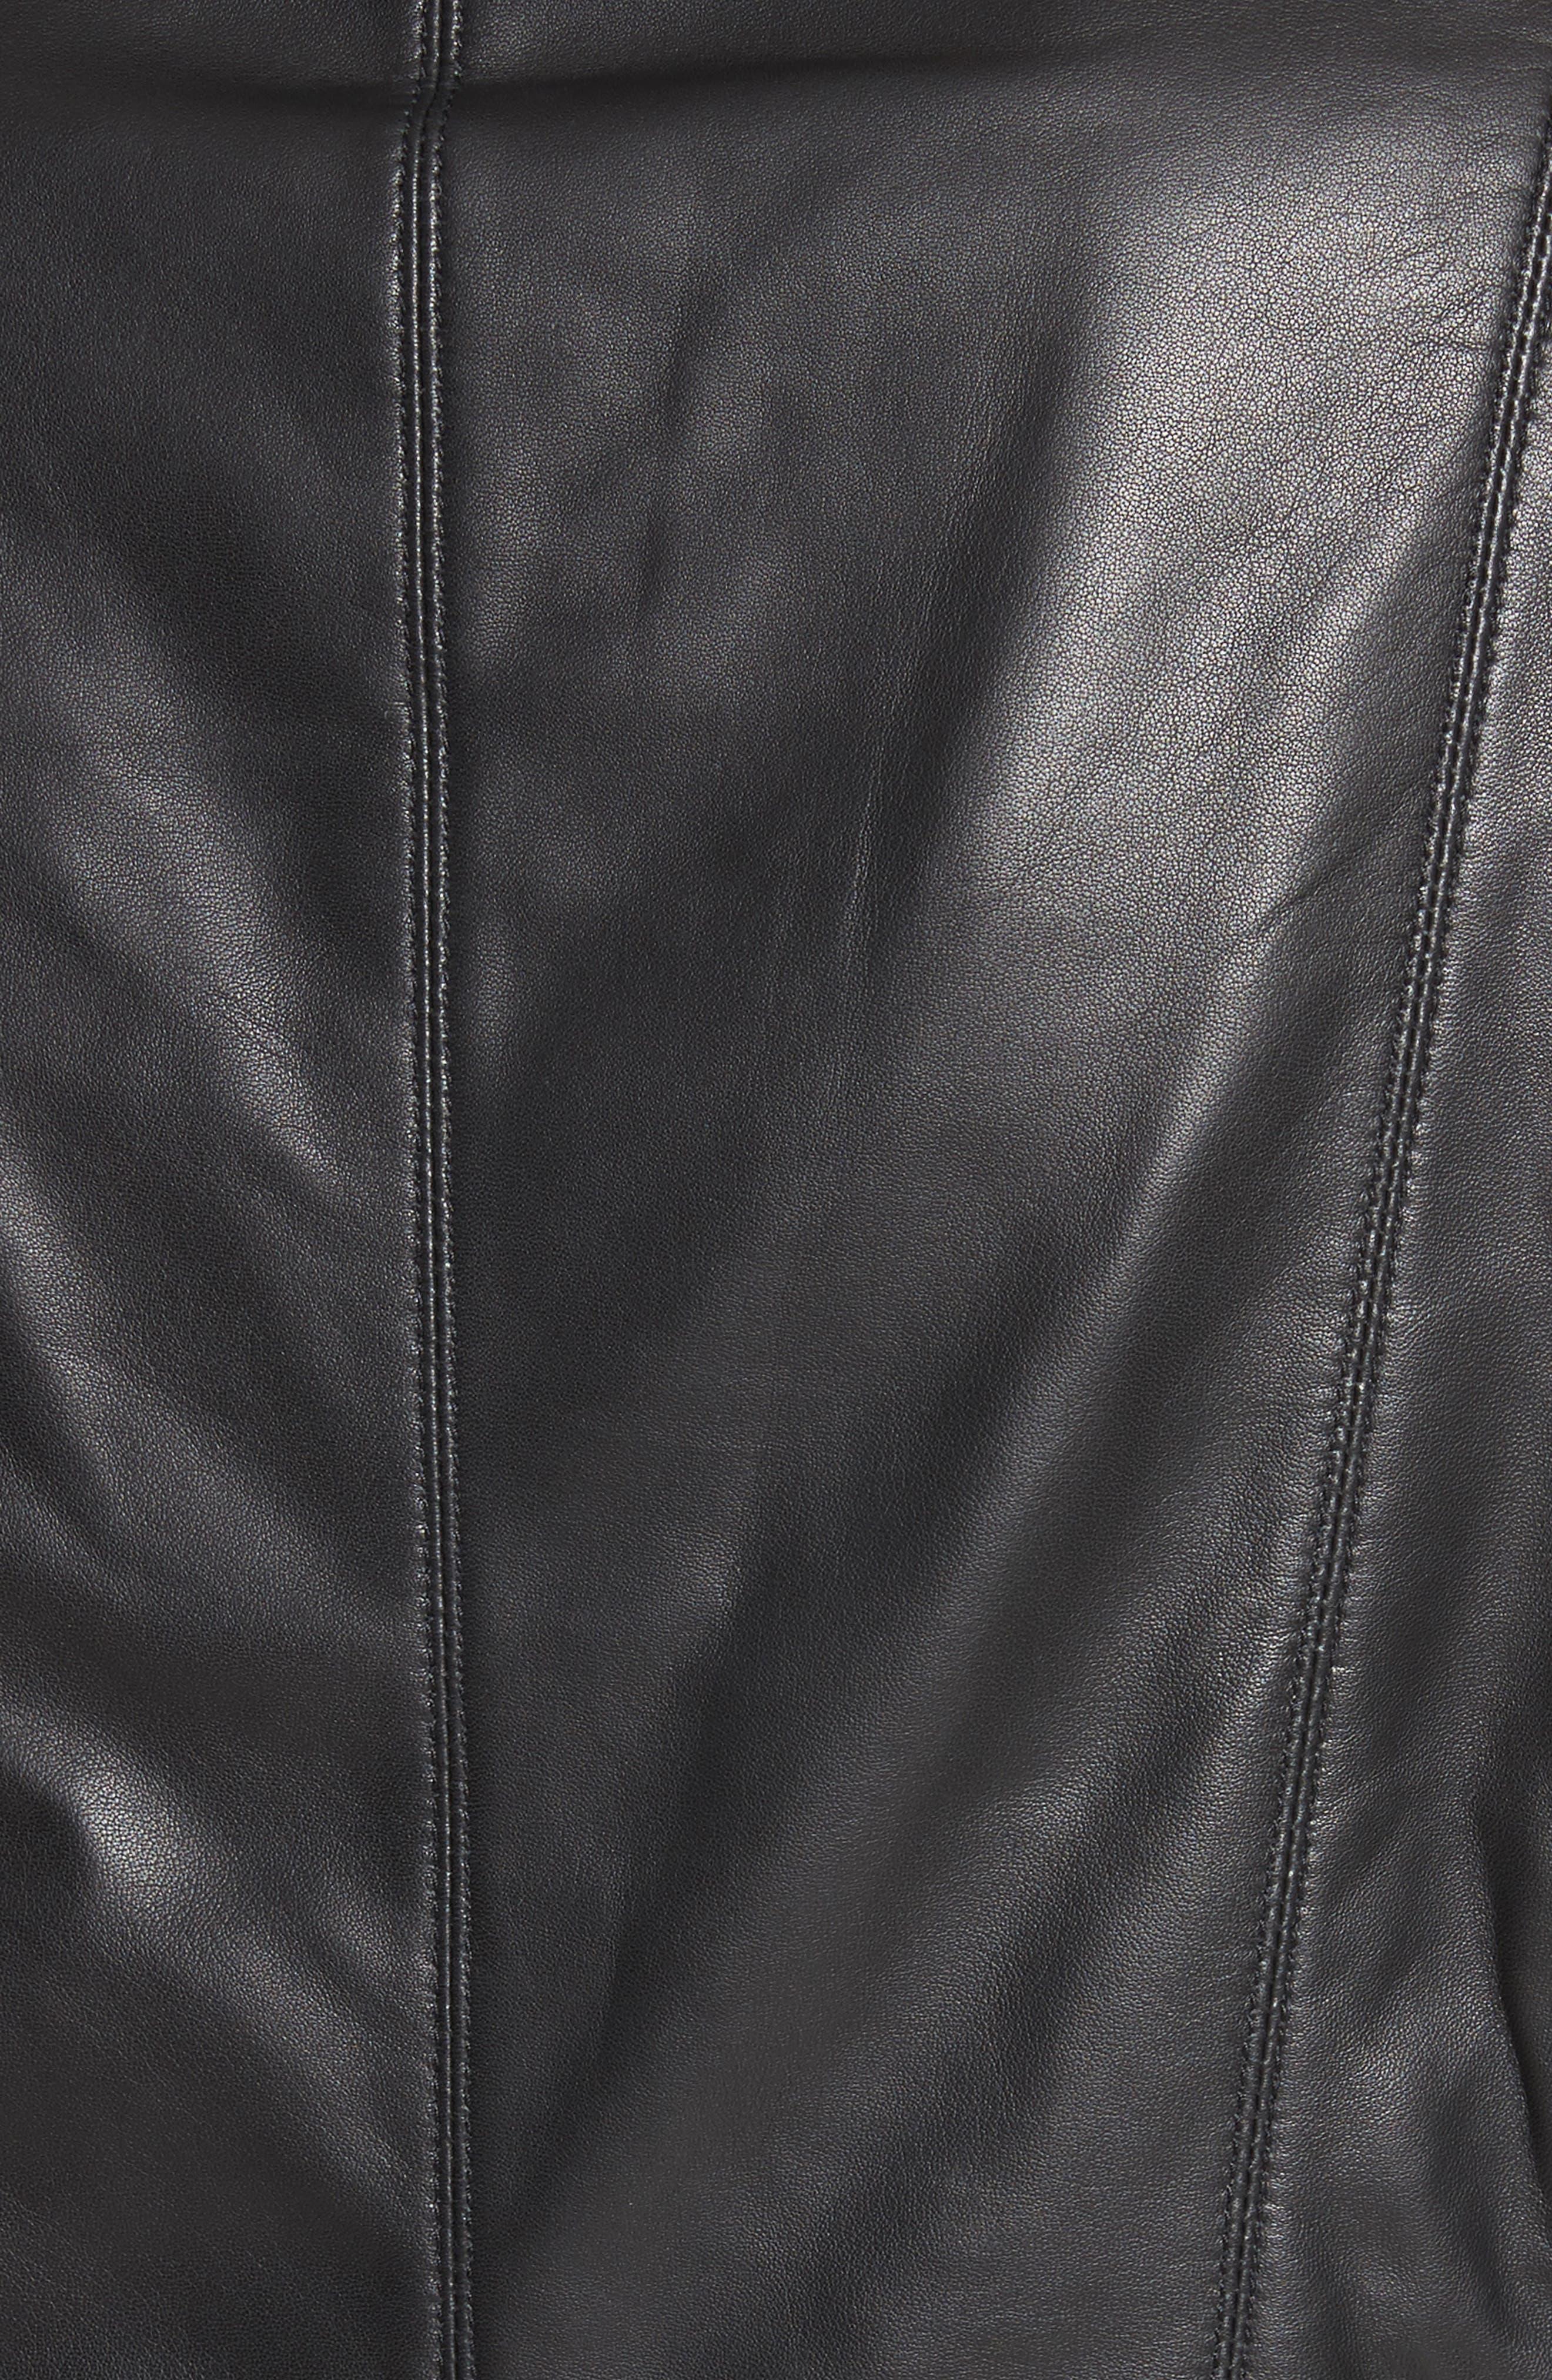 Nappa Leather Moto Jacket,                             Alternate thumbnail 5, color,                             Caviar